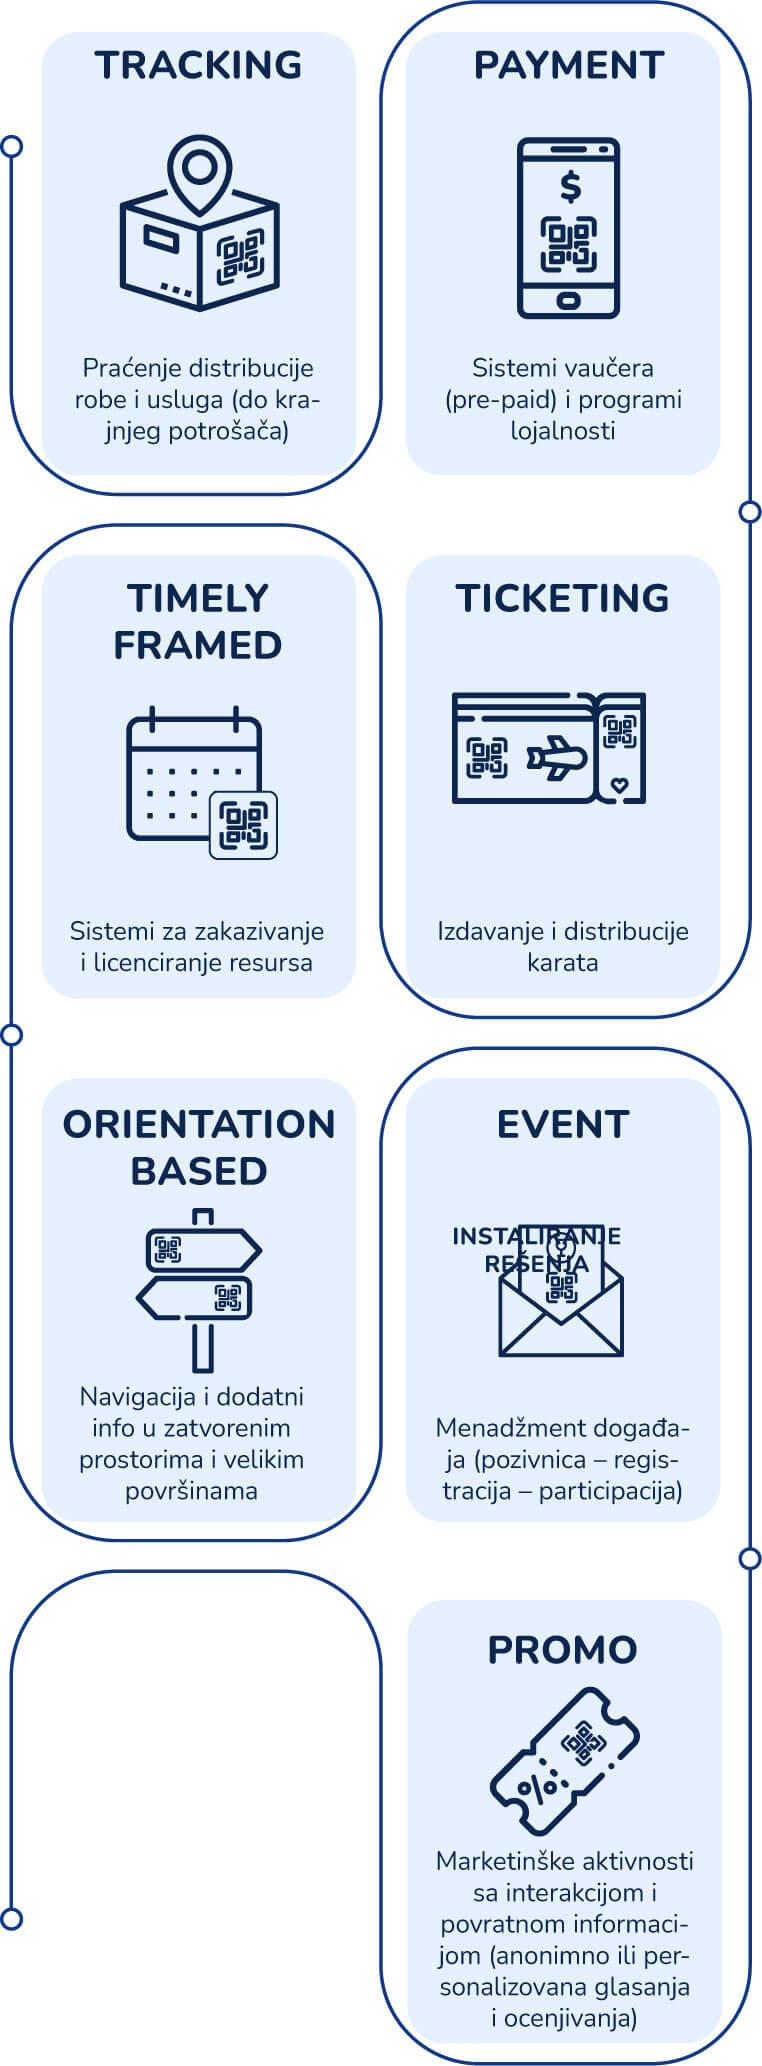 SQRE-upotreba-platforme-mobile (1)